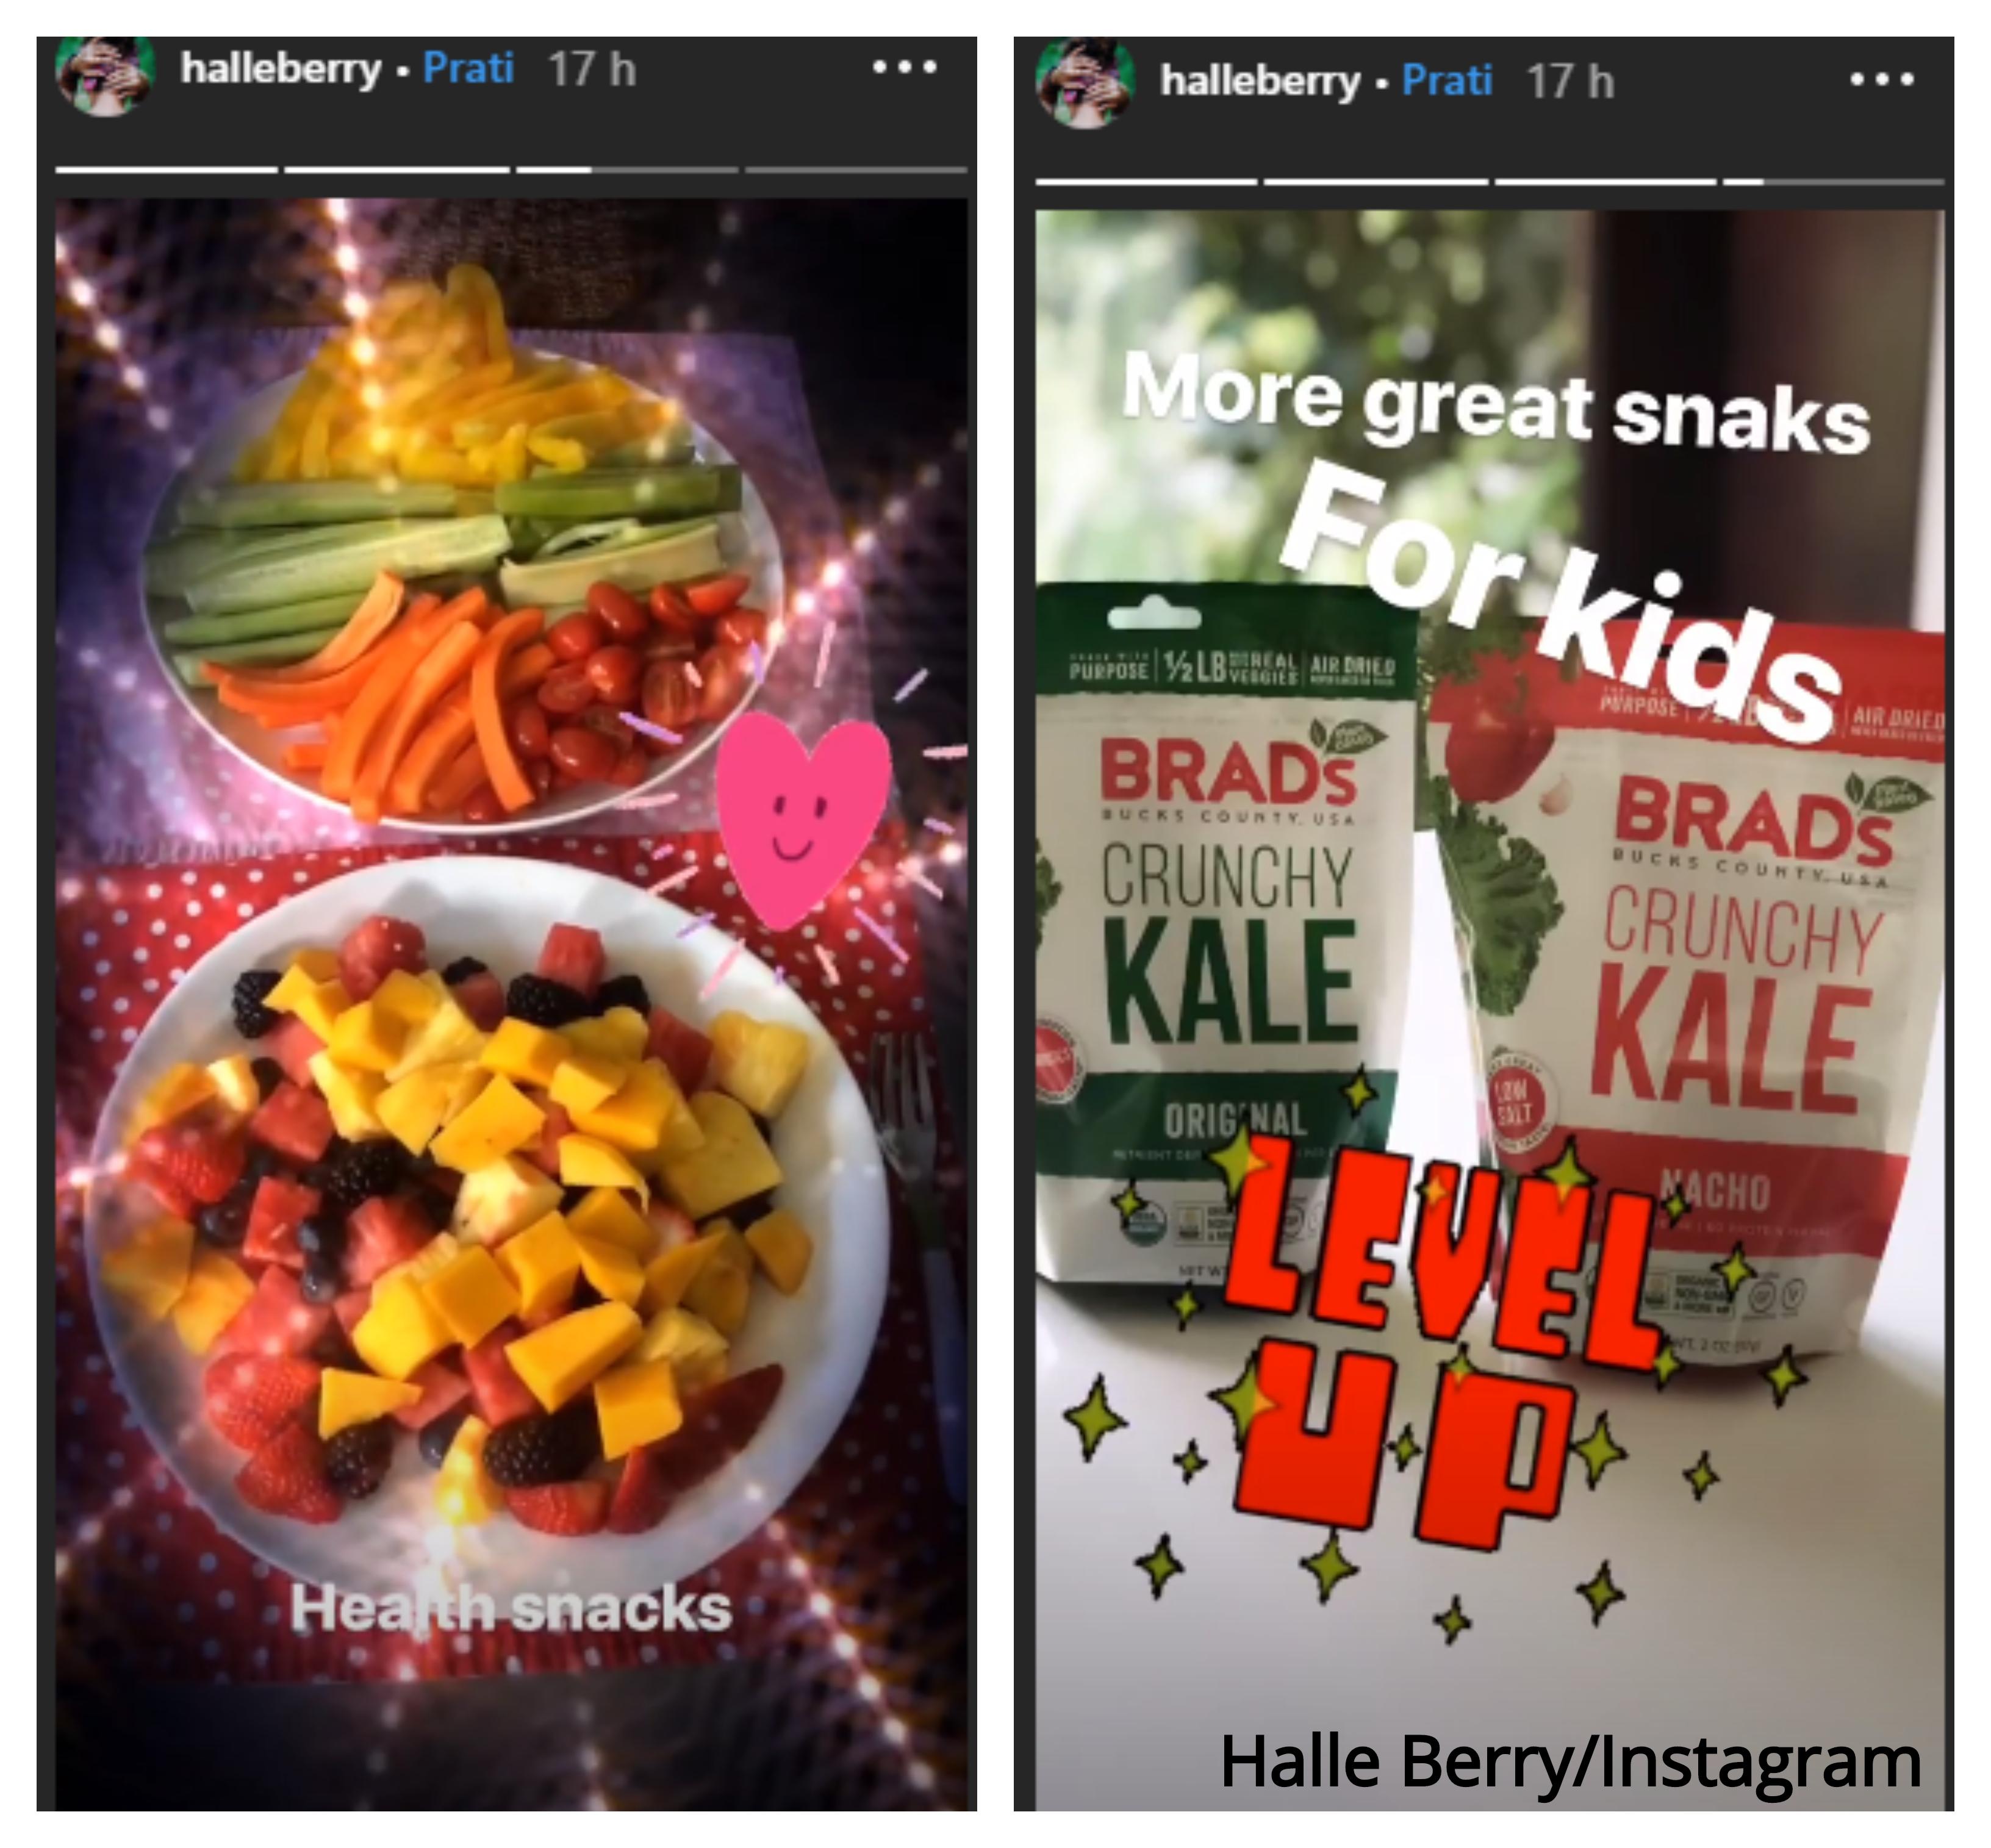 Halle Berry, Instagram